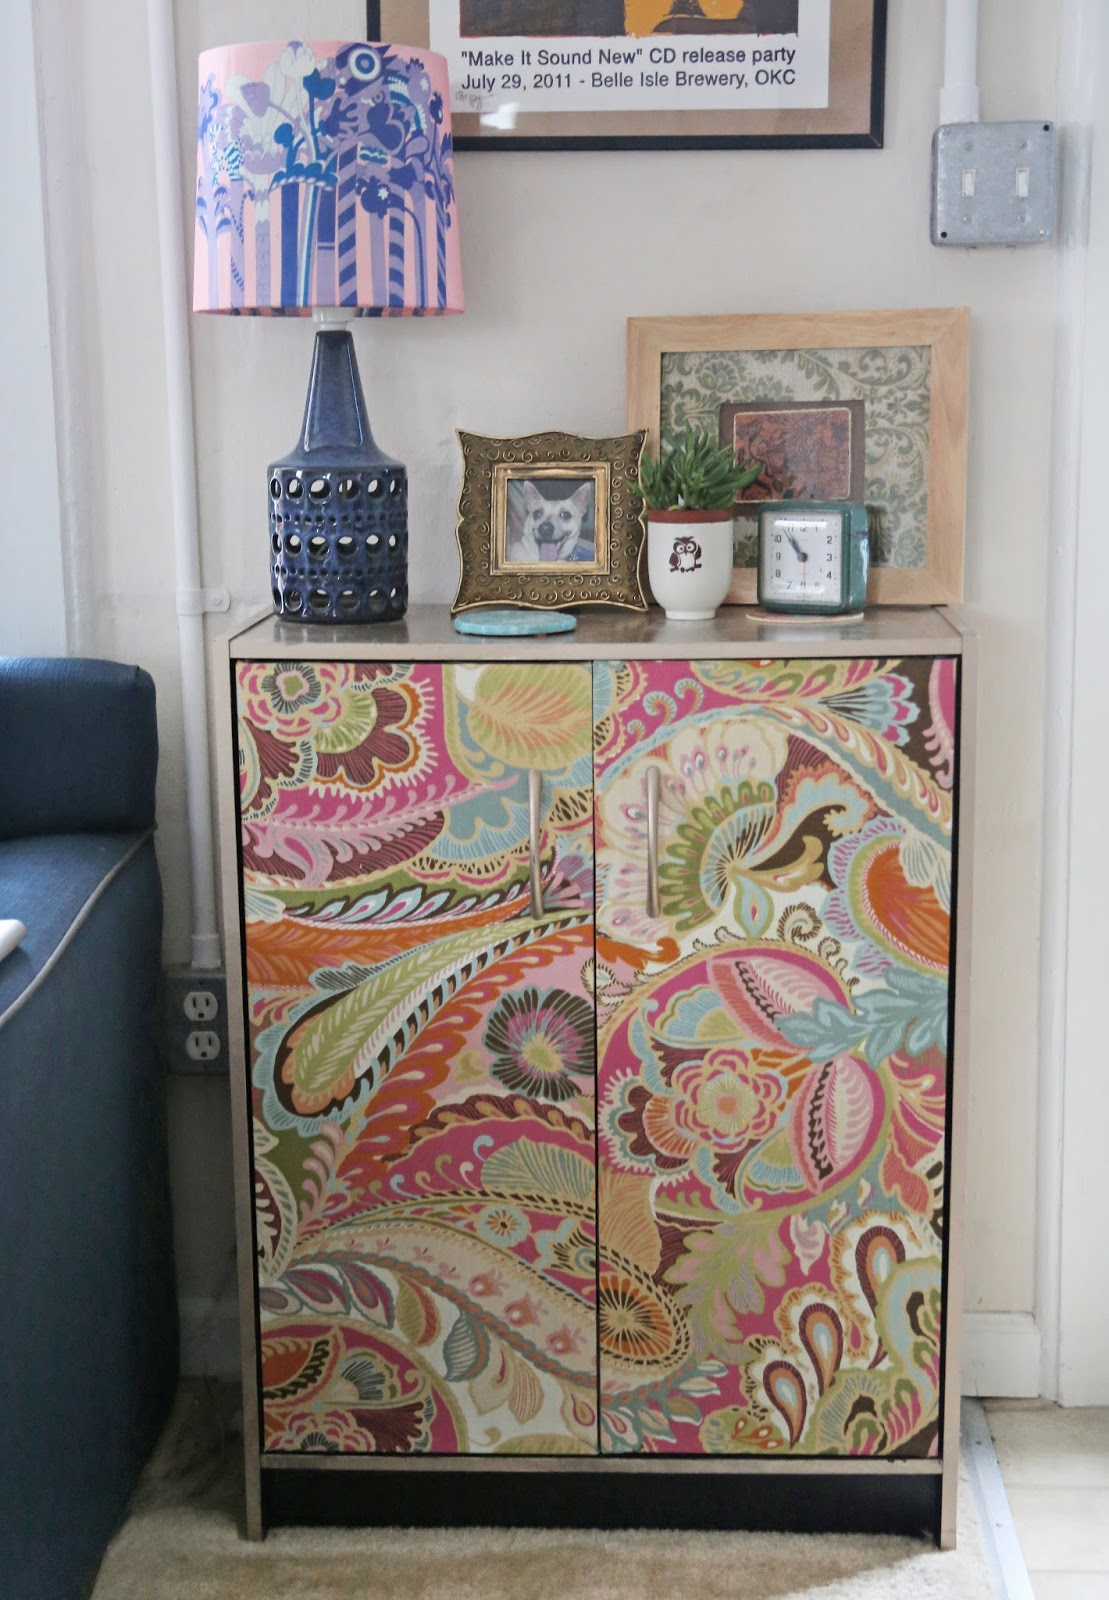 Update Cheap Furniture: DIY Bookshelf And Furniture Revamp With Fabric